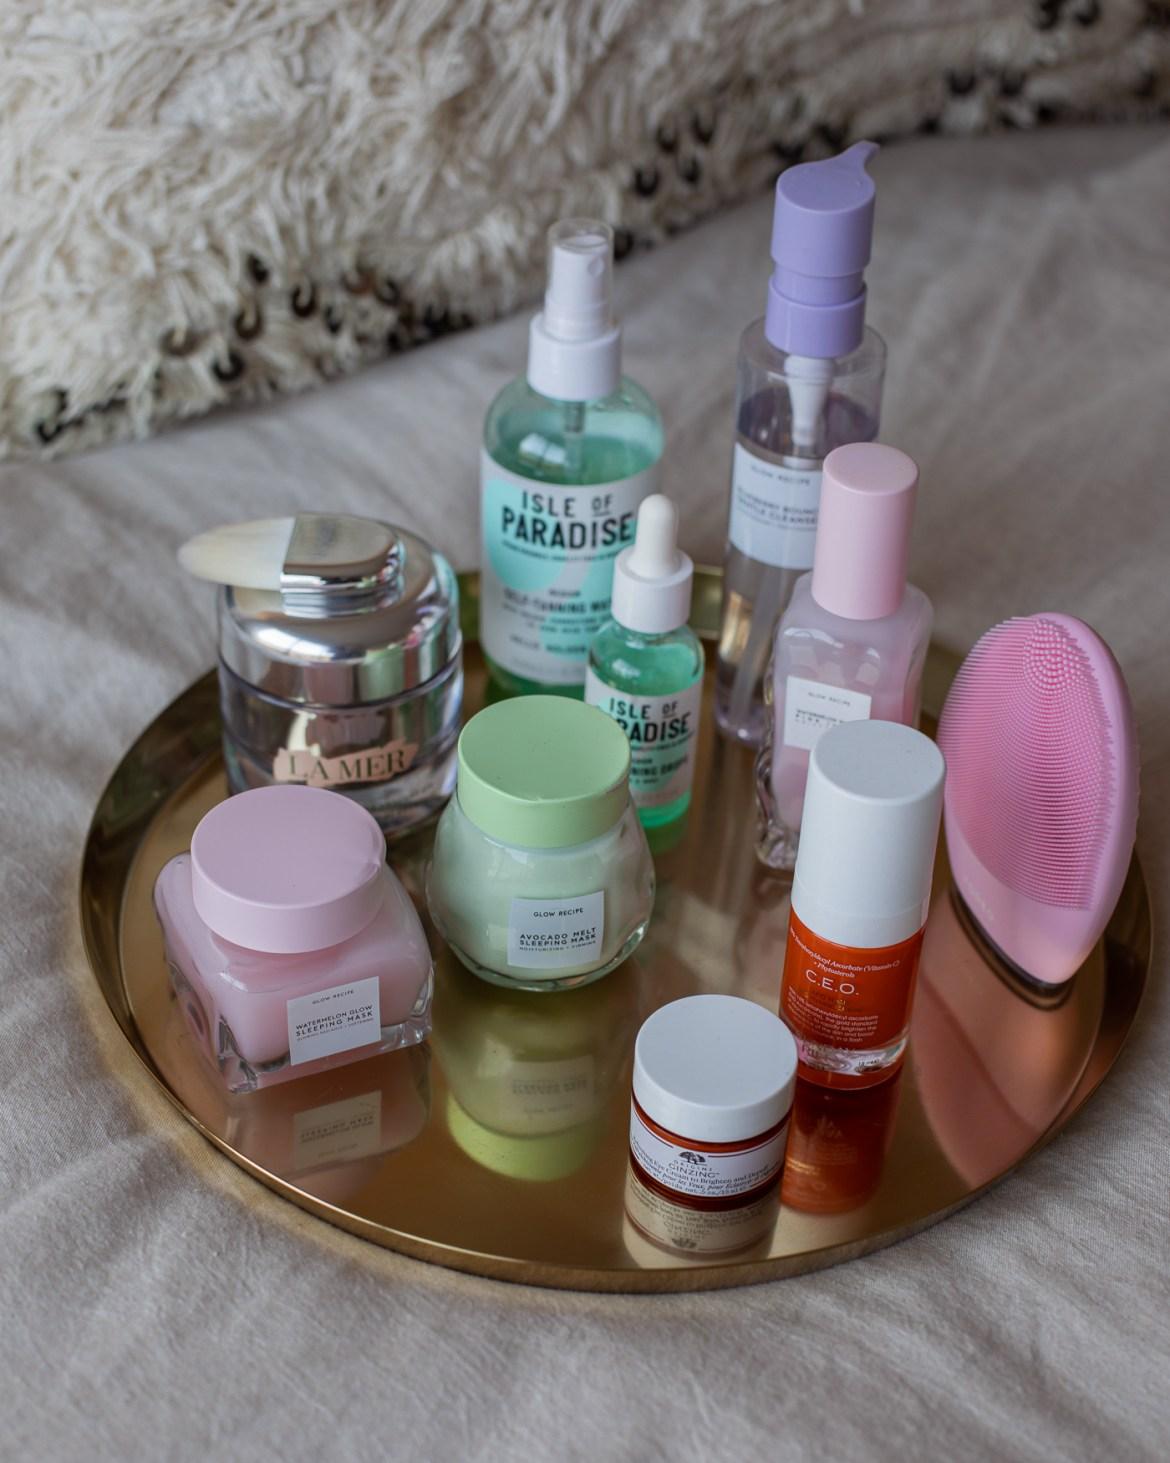 Origins, Glow Recipe, Foreo, Isle of Paradise beauty skincare products